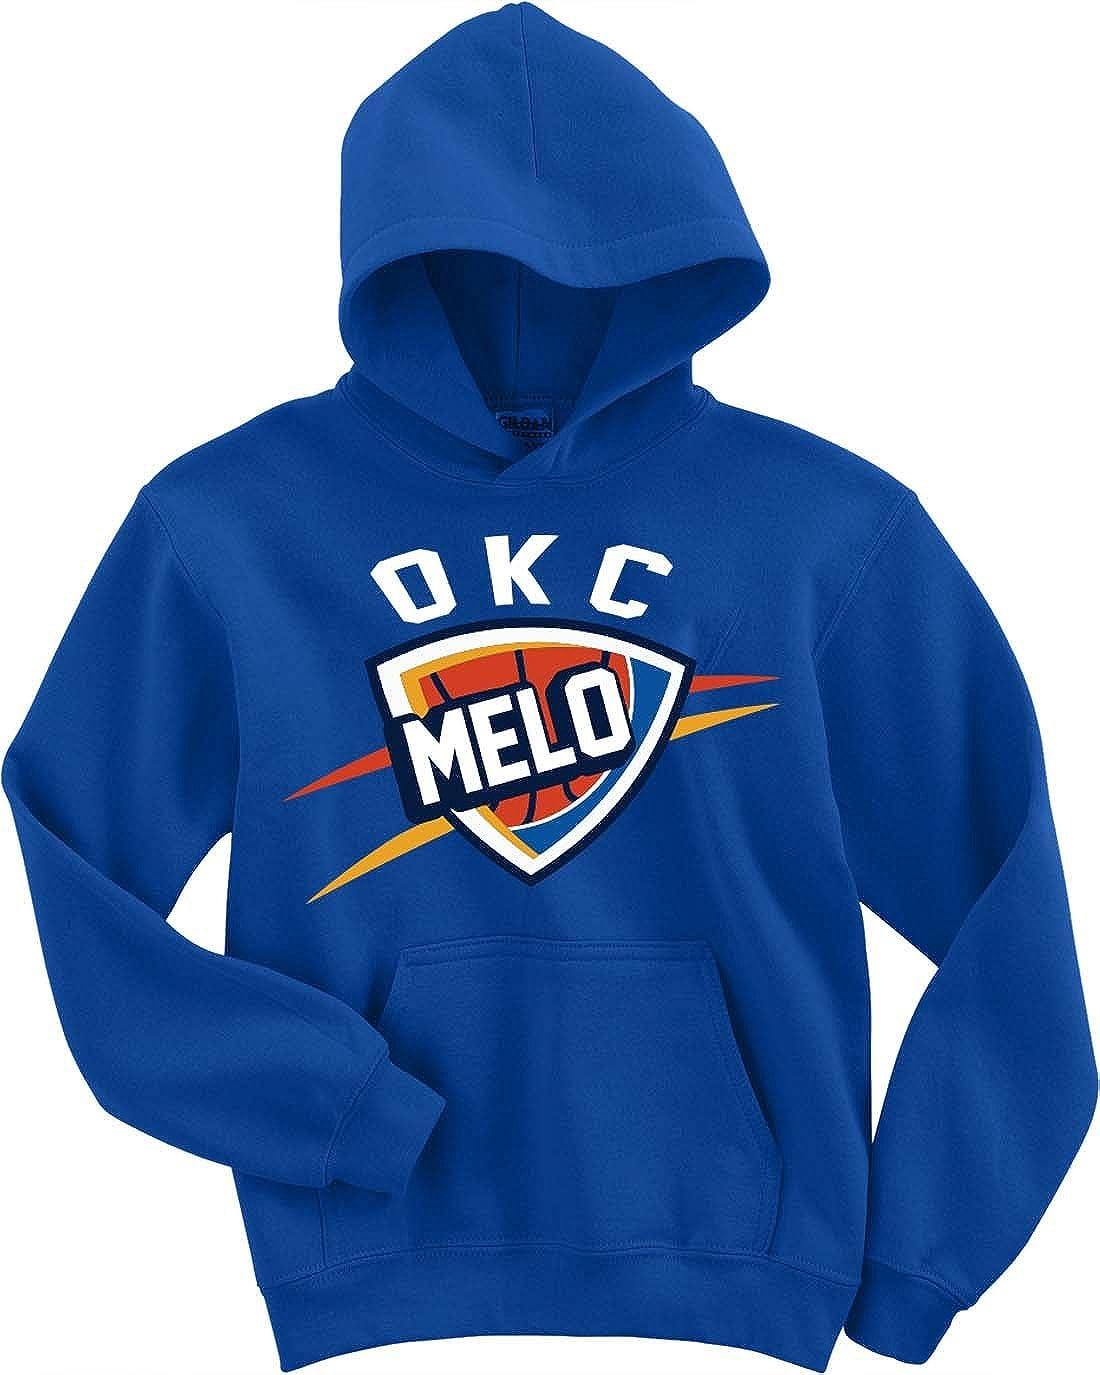 The Silo Blue Oklahoma City Melo Logo Hooded Sweatshirt